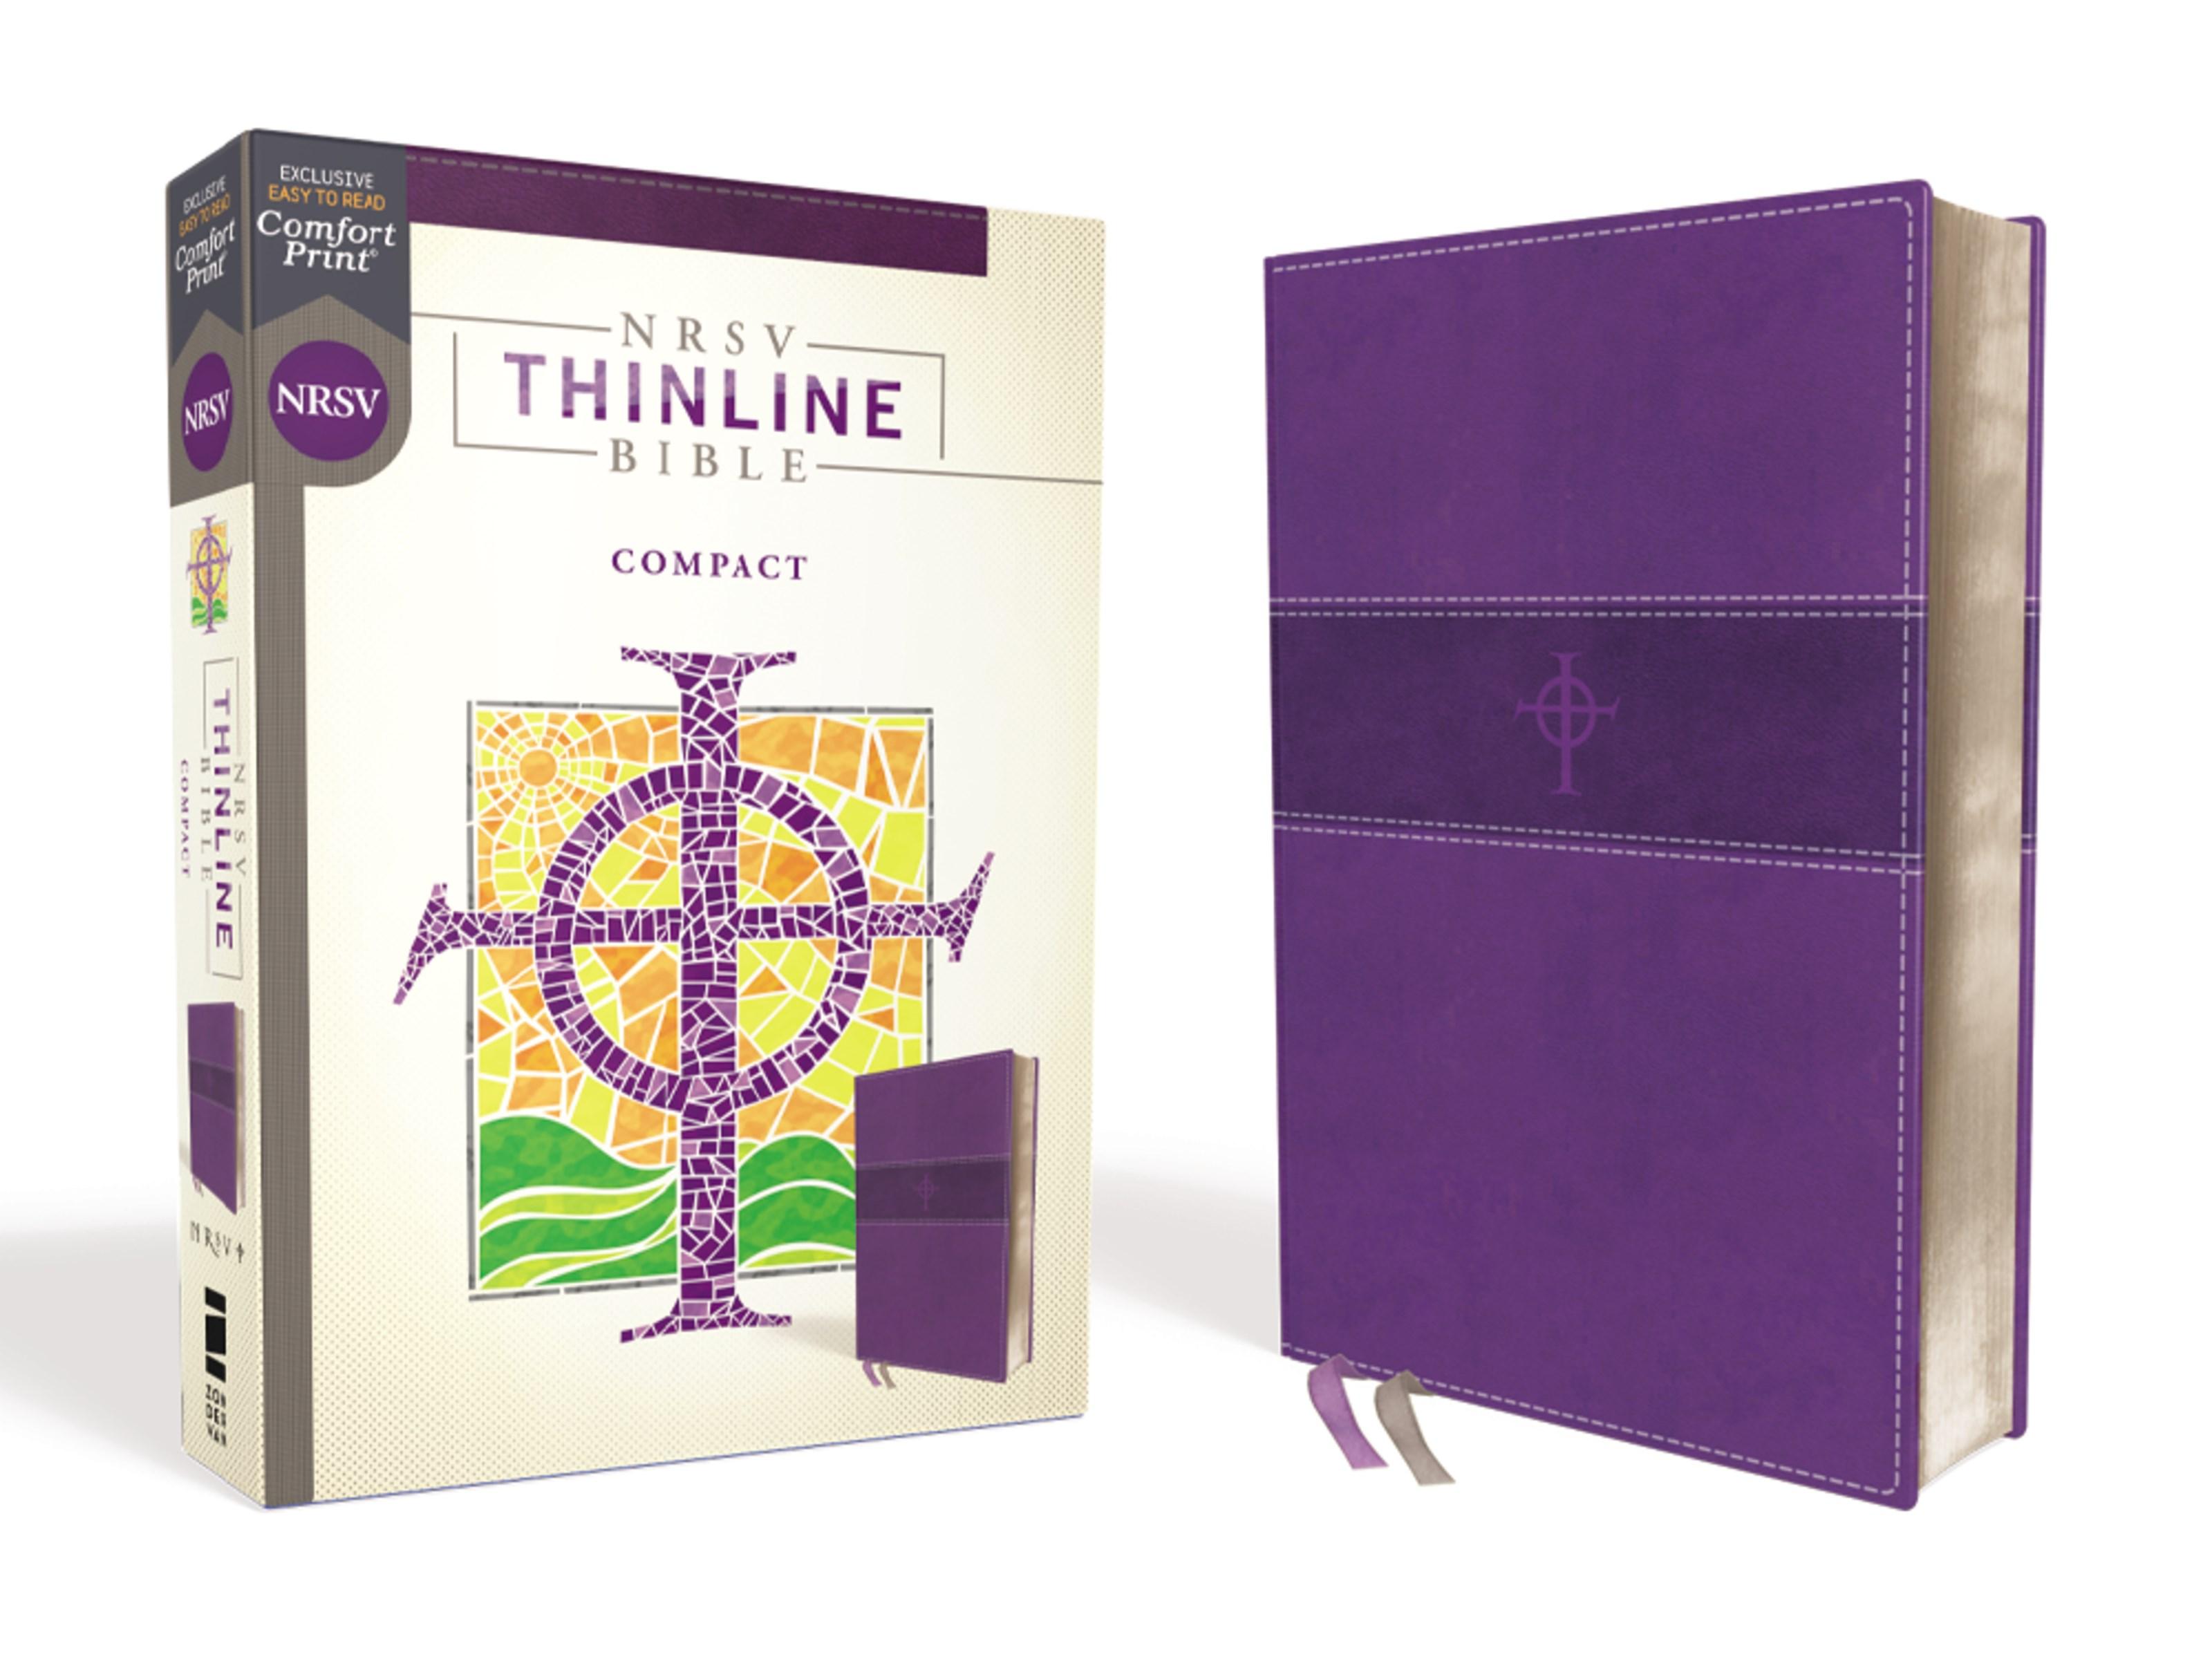 NRSV Thinline Bible/Compact (Comfort Print)-Purple Leathersoft